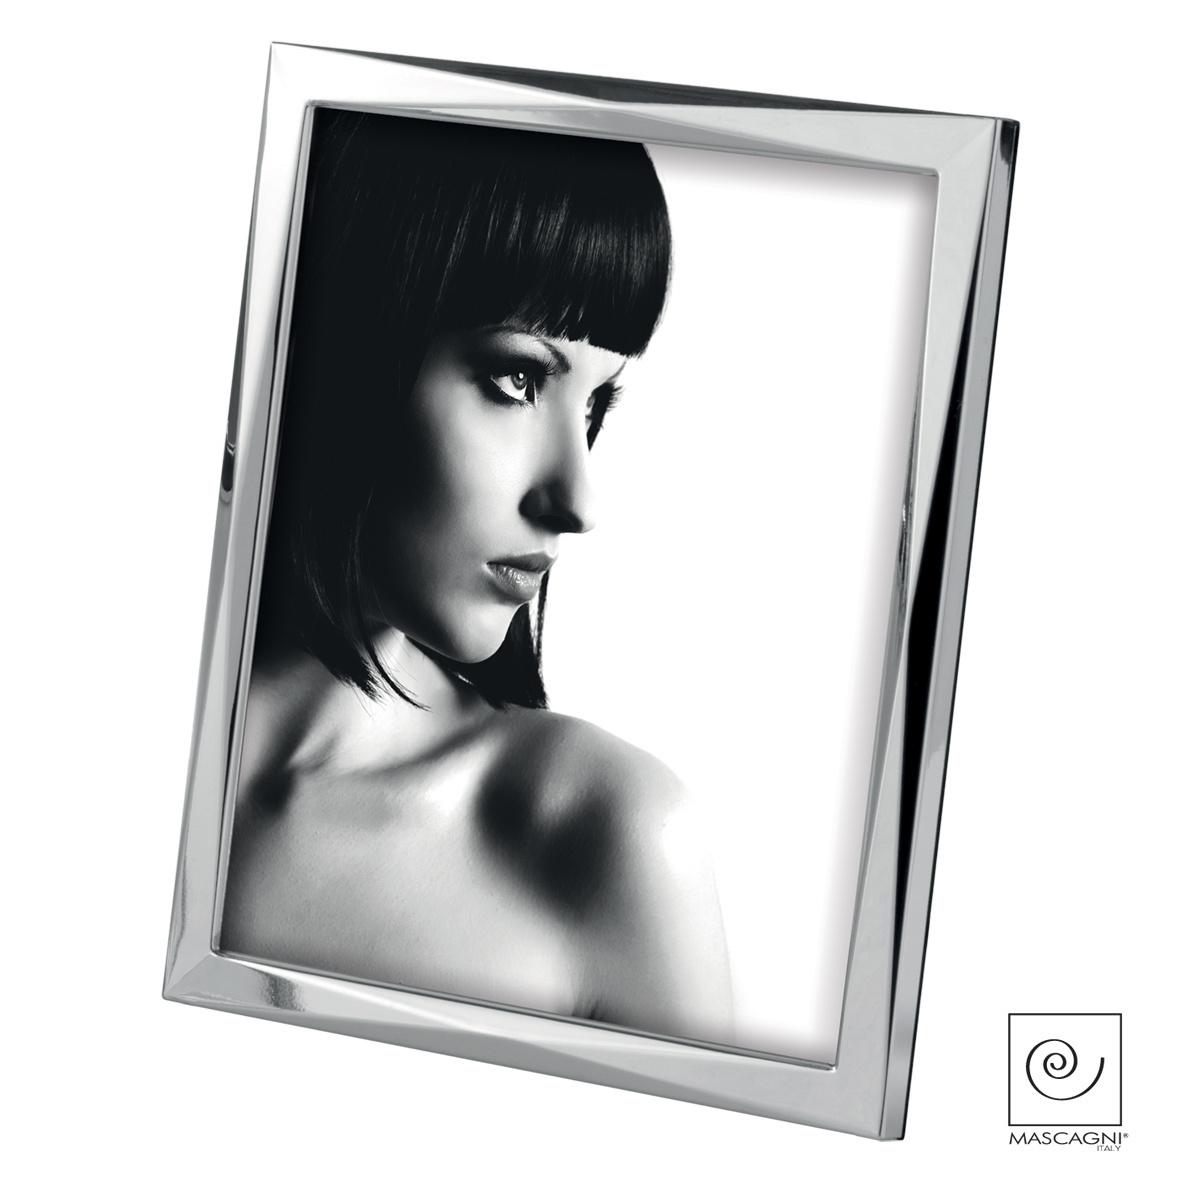 Art Mascagni A188 PHOTO FRAME 10X15